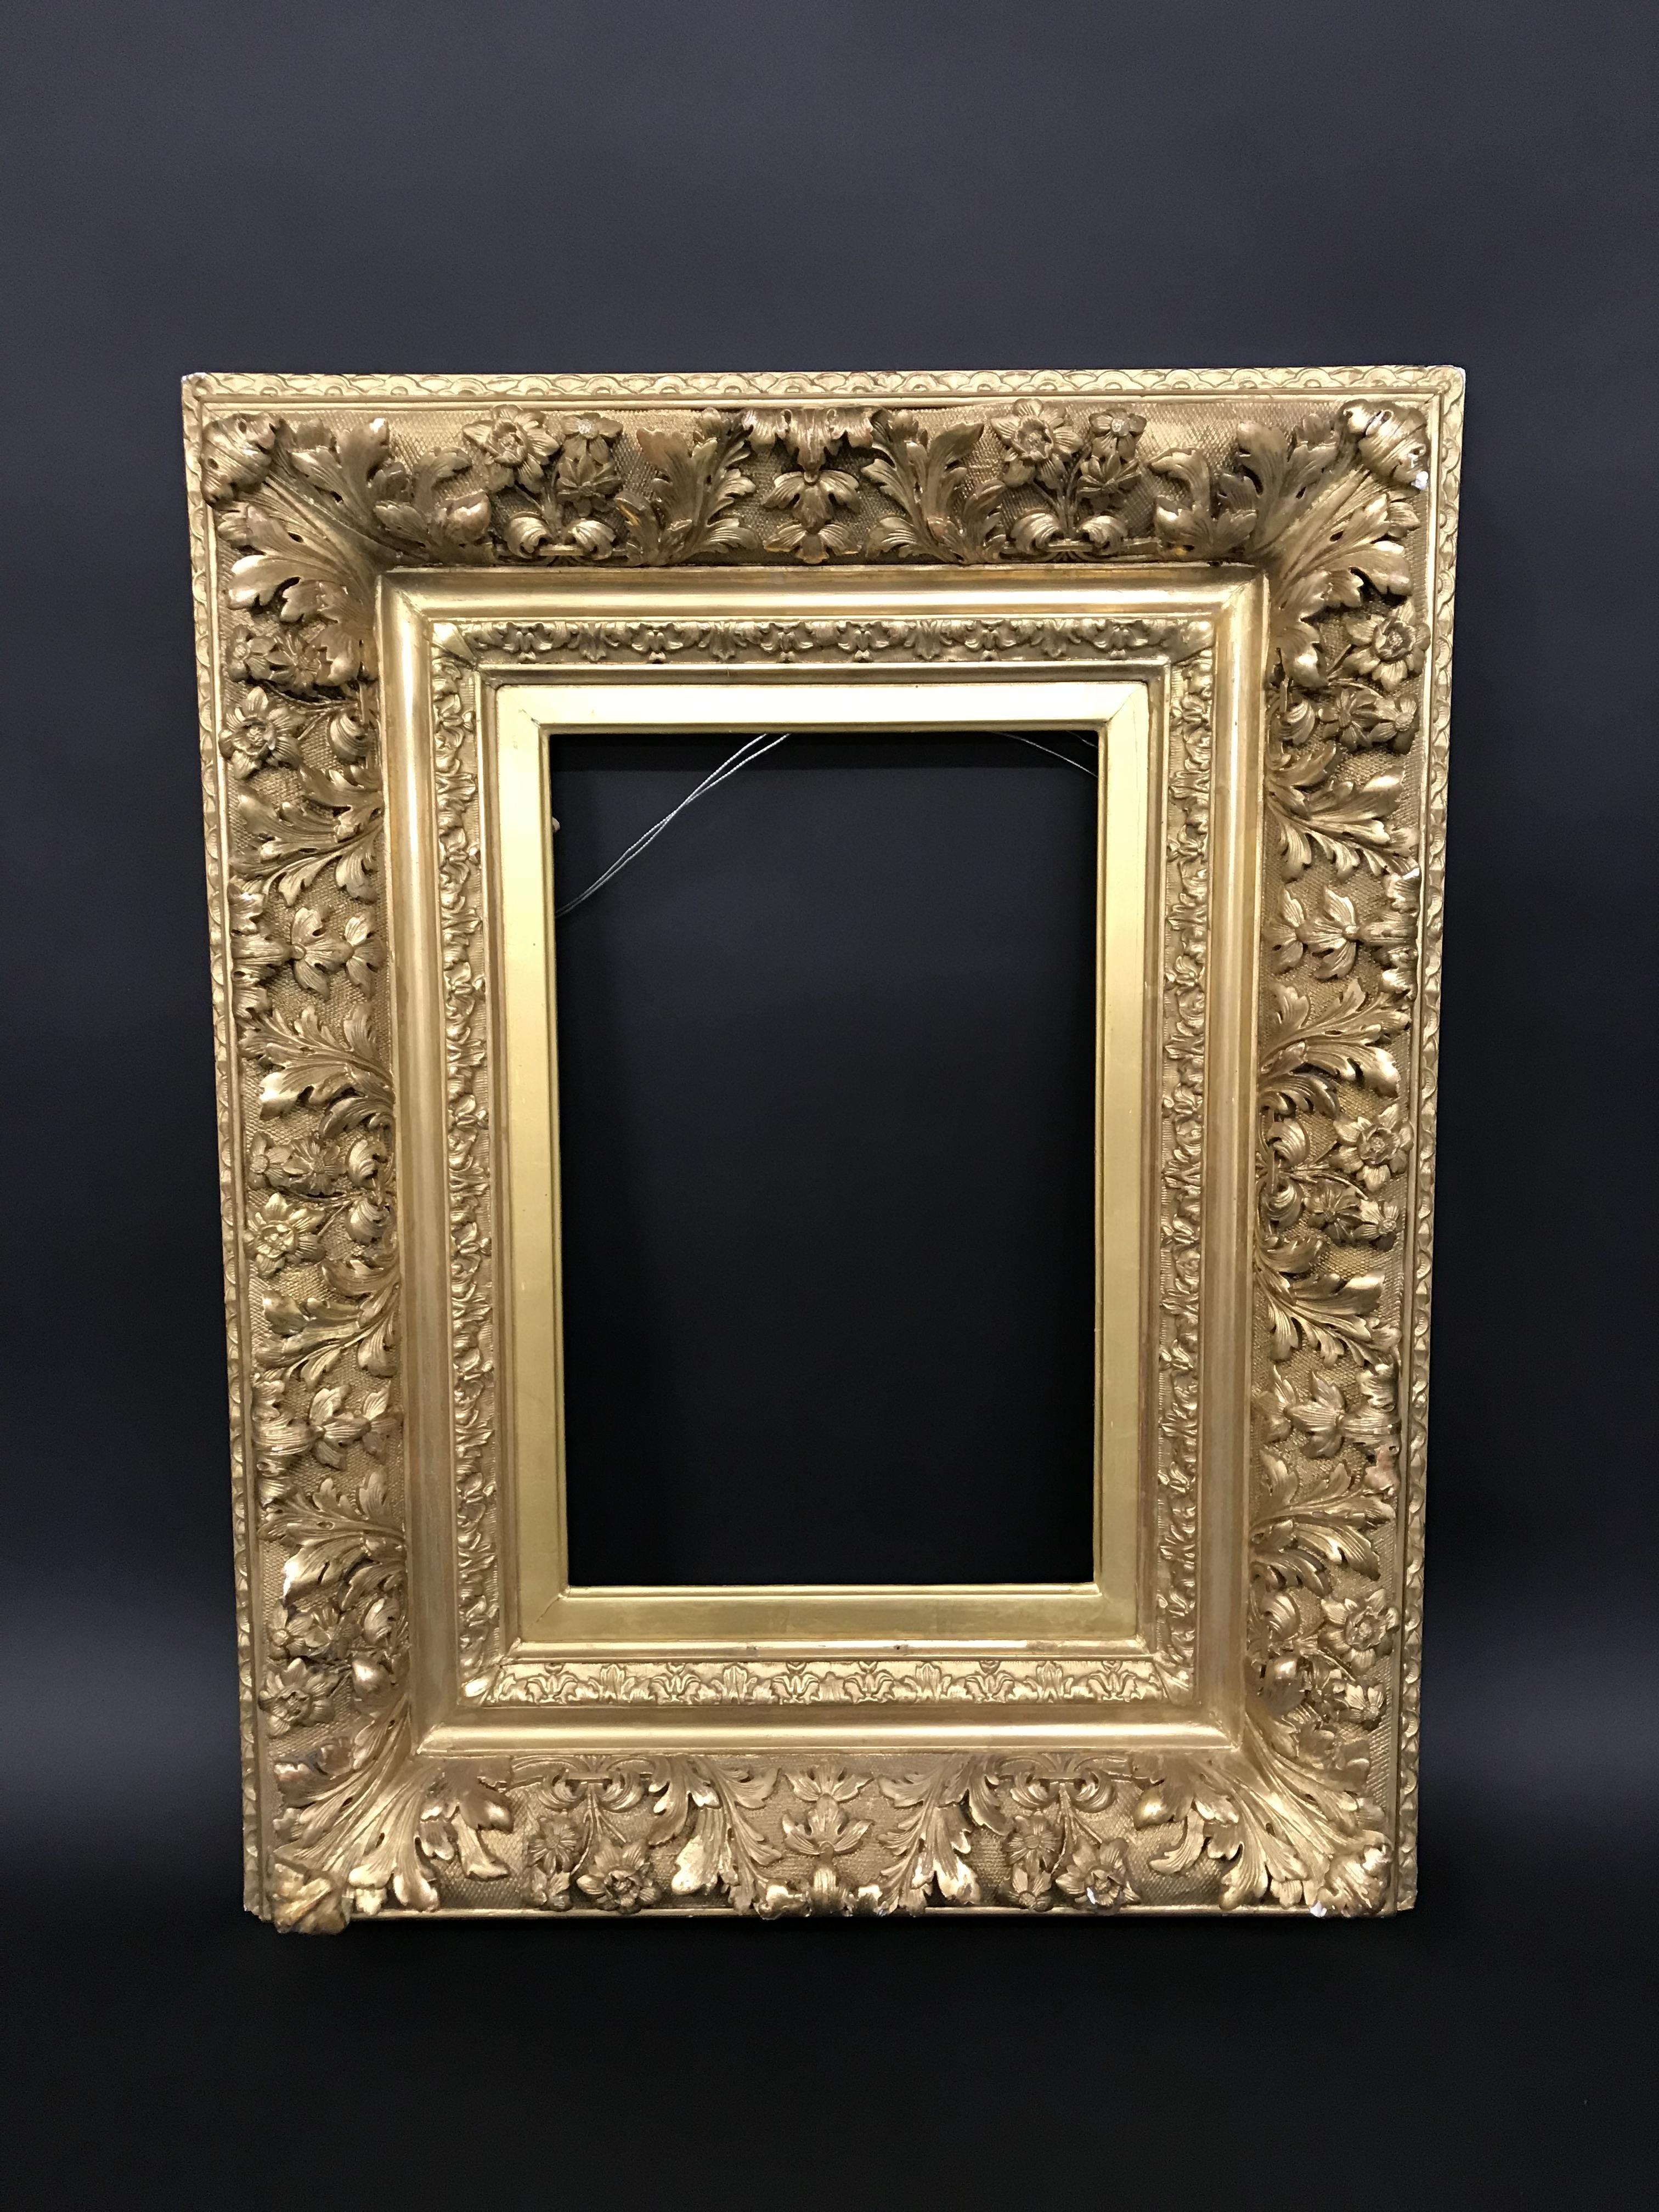 "Lot 54 - 19th Century French School. A Fine Gilt Composition Barbizon Frame, 16"" x 10"" (rebate)."